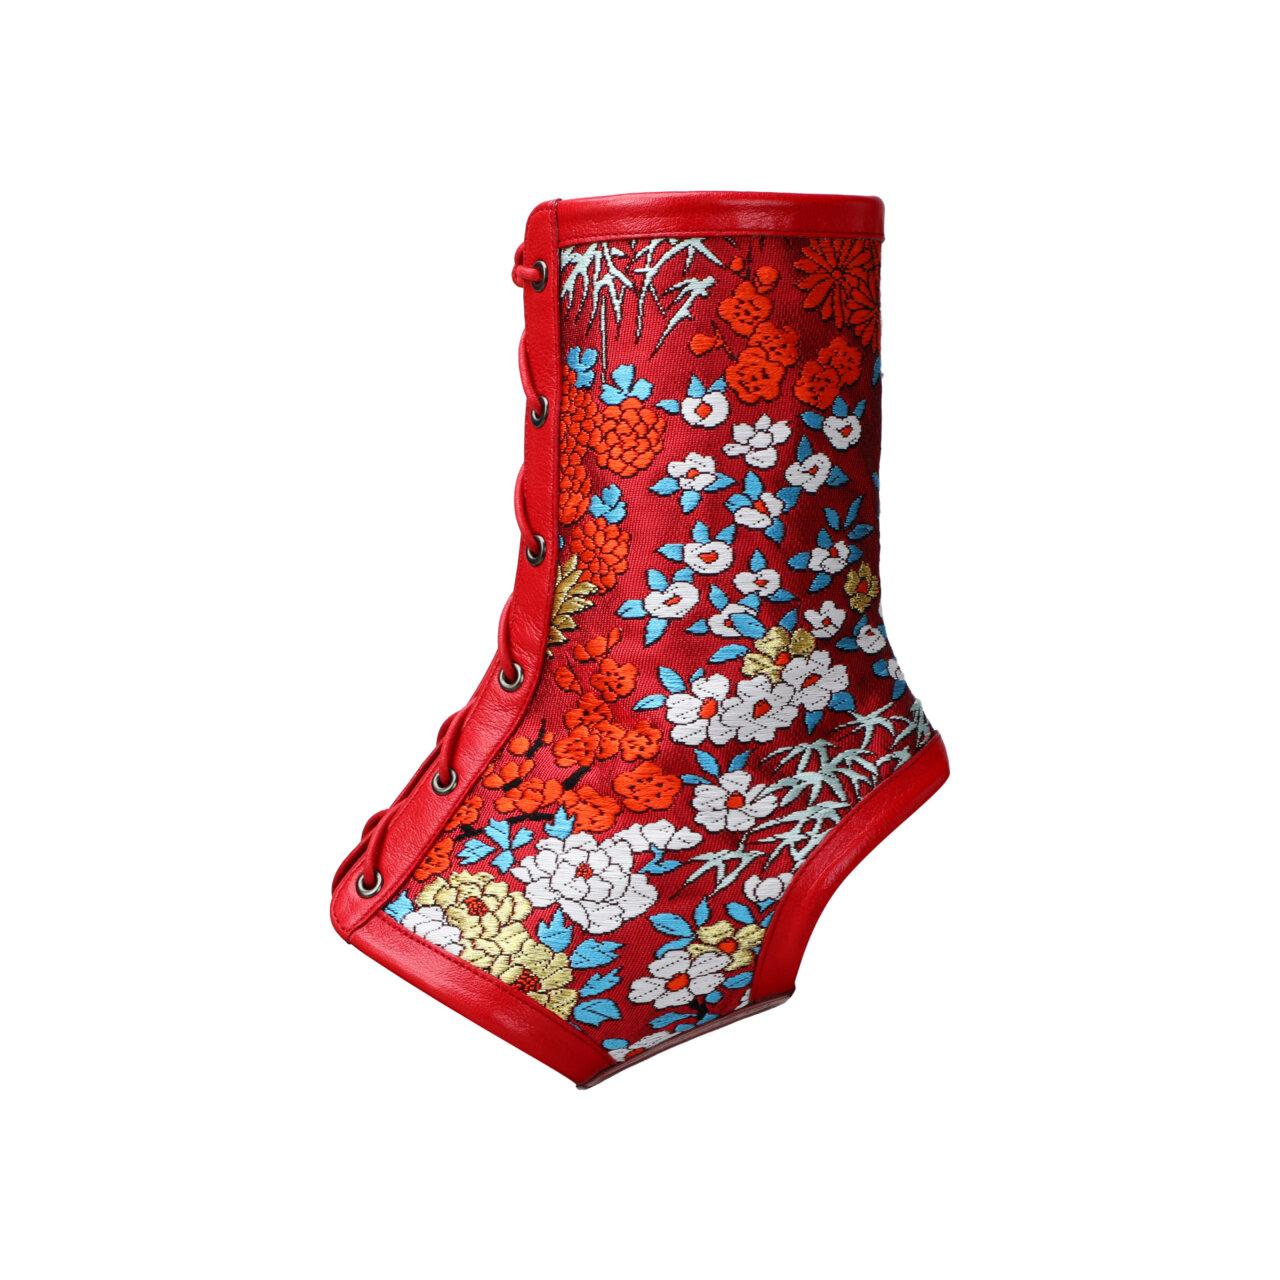 『Obi de Boots 粋』百花〜Hyakka〜(ブーツカバーのみ)の画像